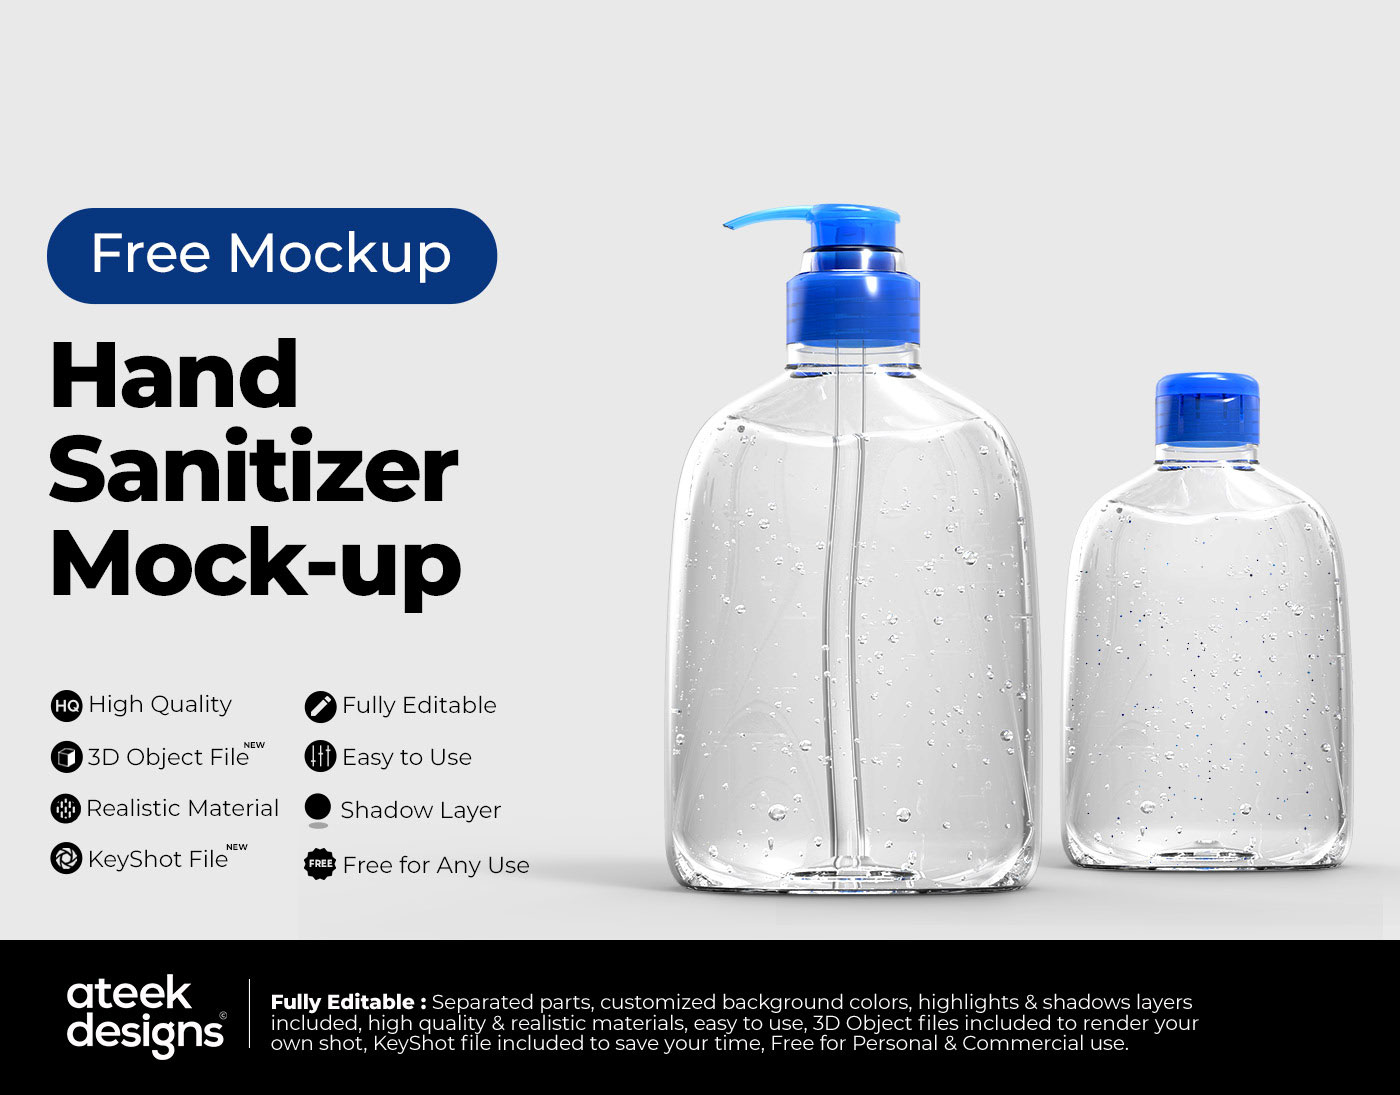 Hand Sanitizer Bottle Free Mockup